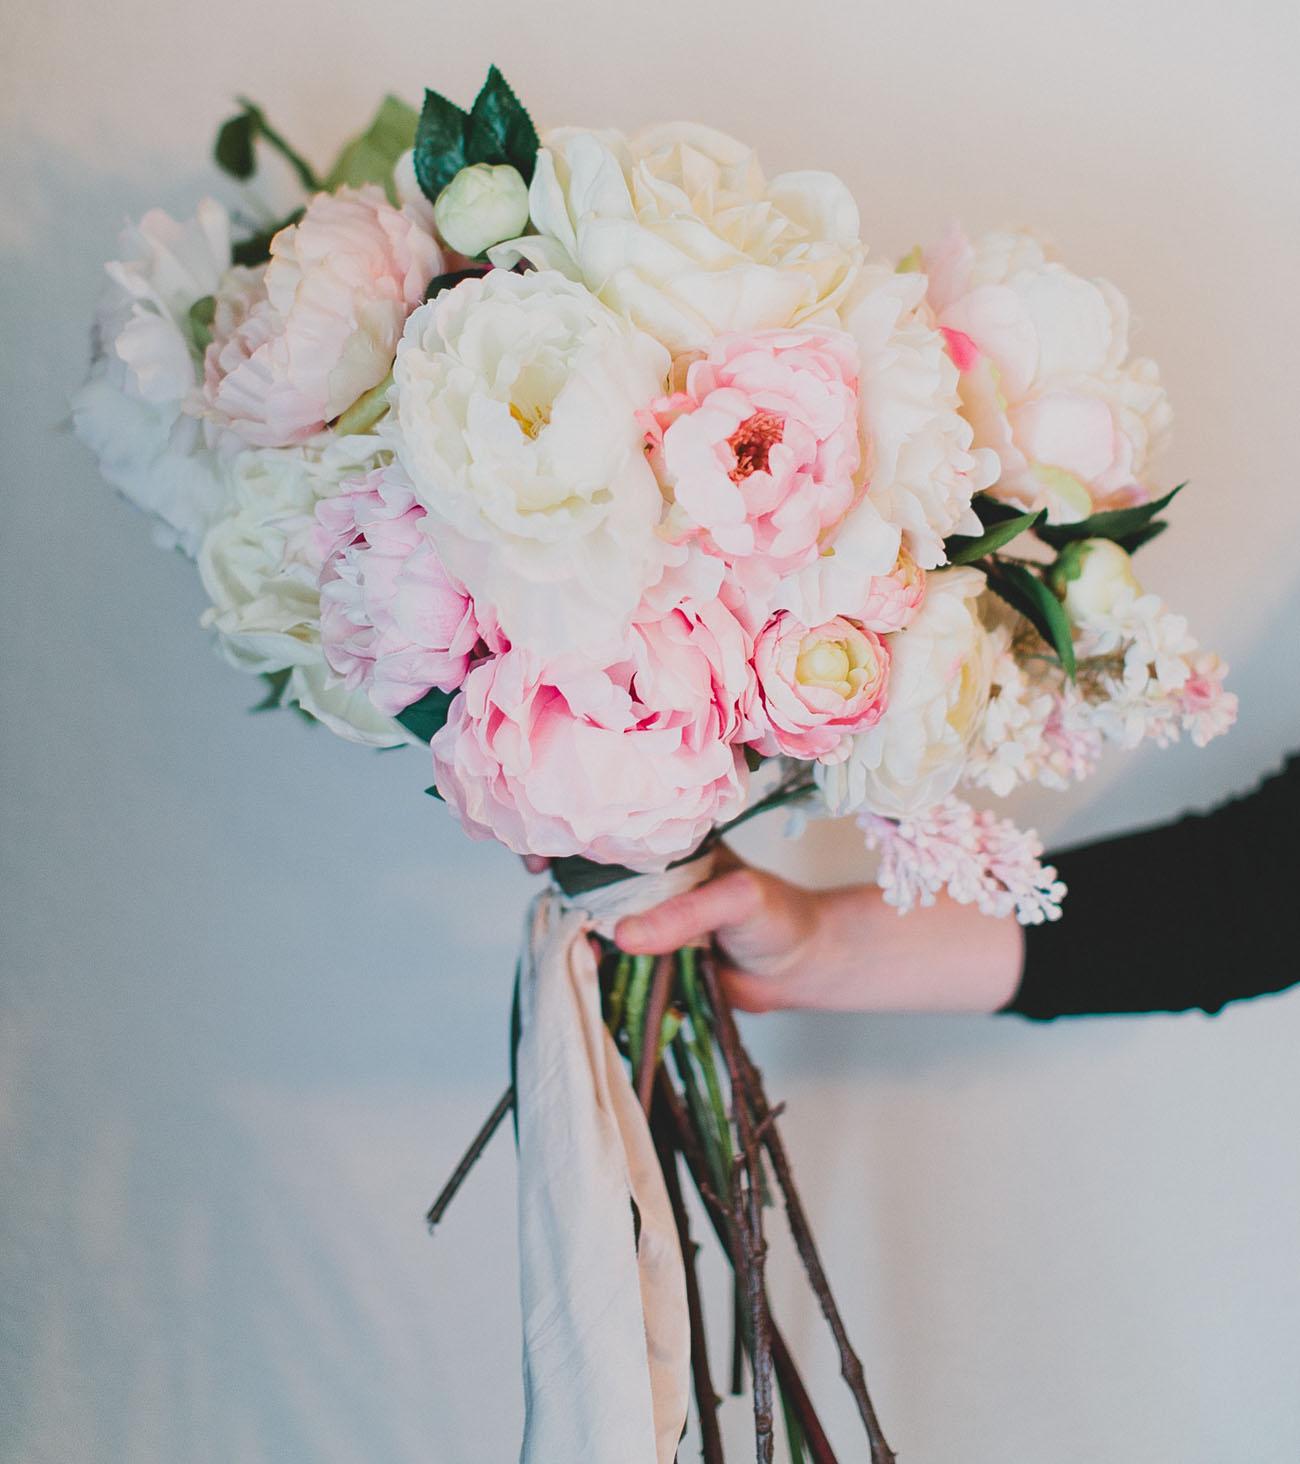 silk flowers bouquets for wedding diy photo - 1